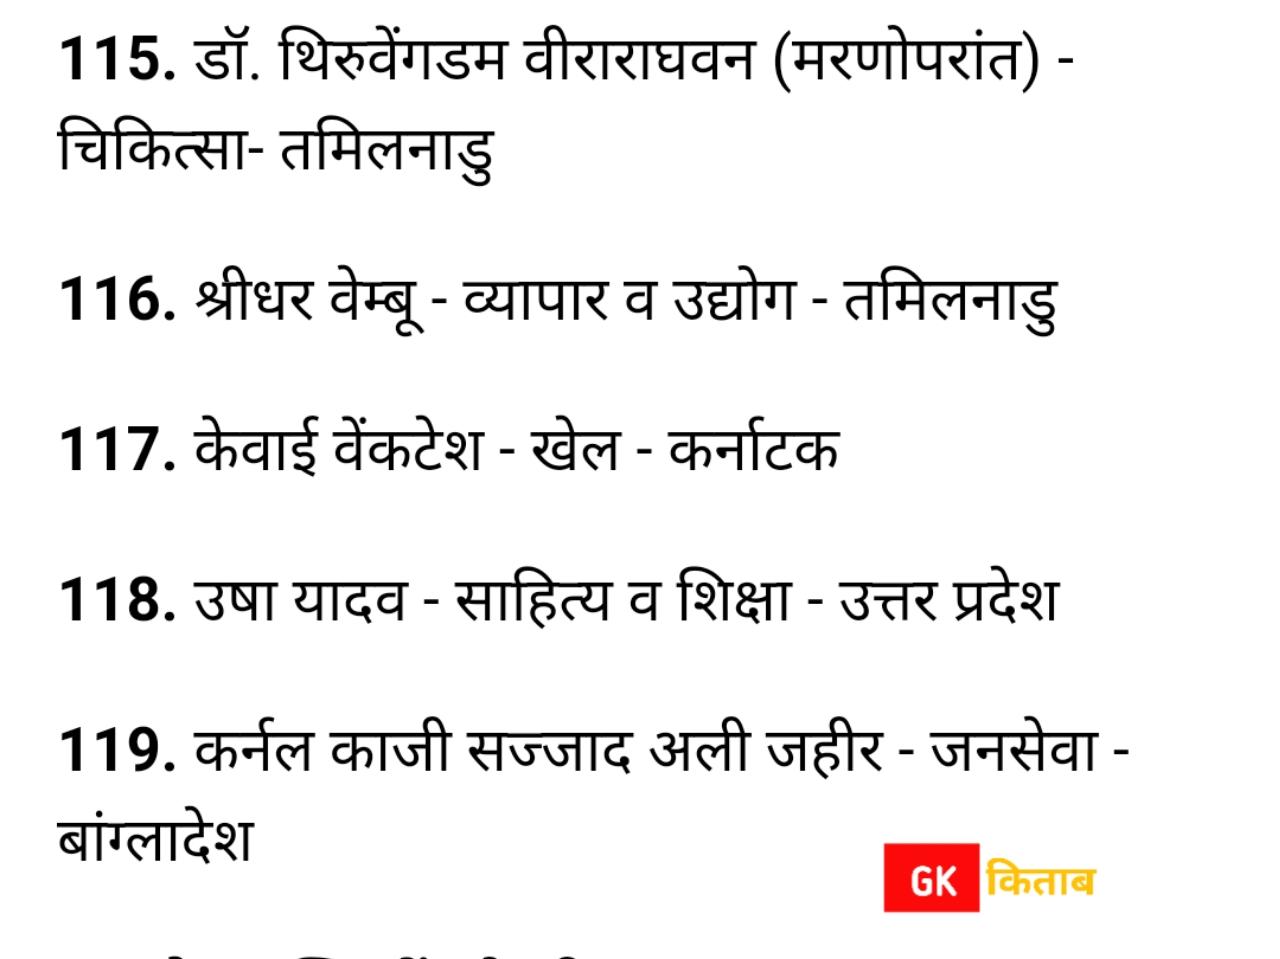 Padma award list 2021 in Hindi